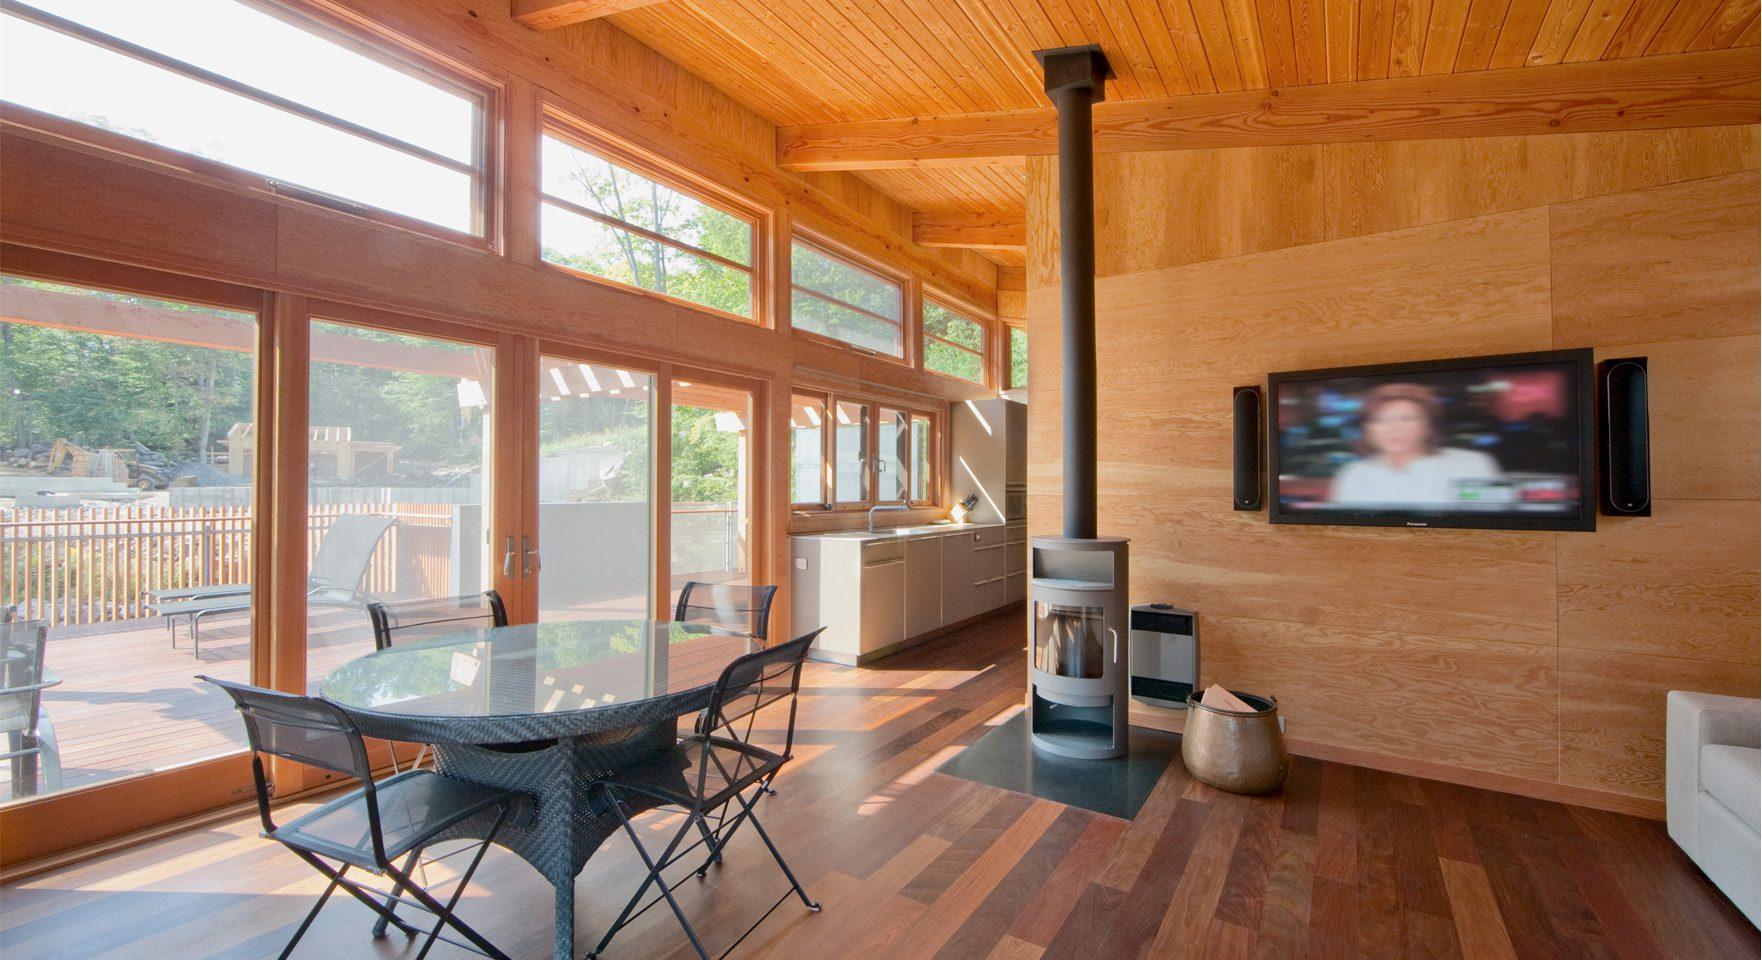 Boathouse-in-Muskoka-Lakes-04